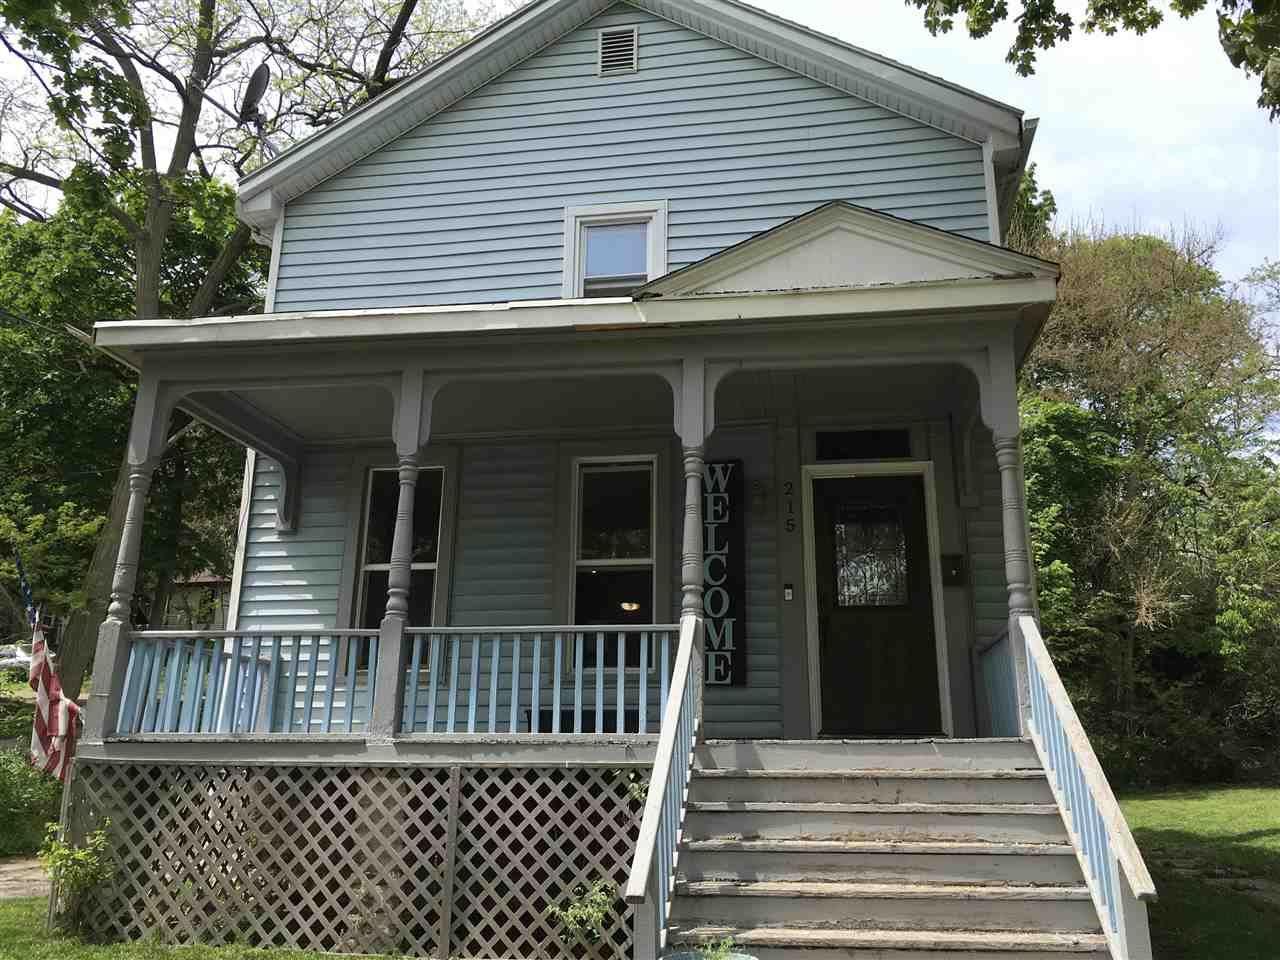 215 Oakland Ave, Janesville, WI 53545 - #: 1909126